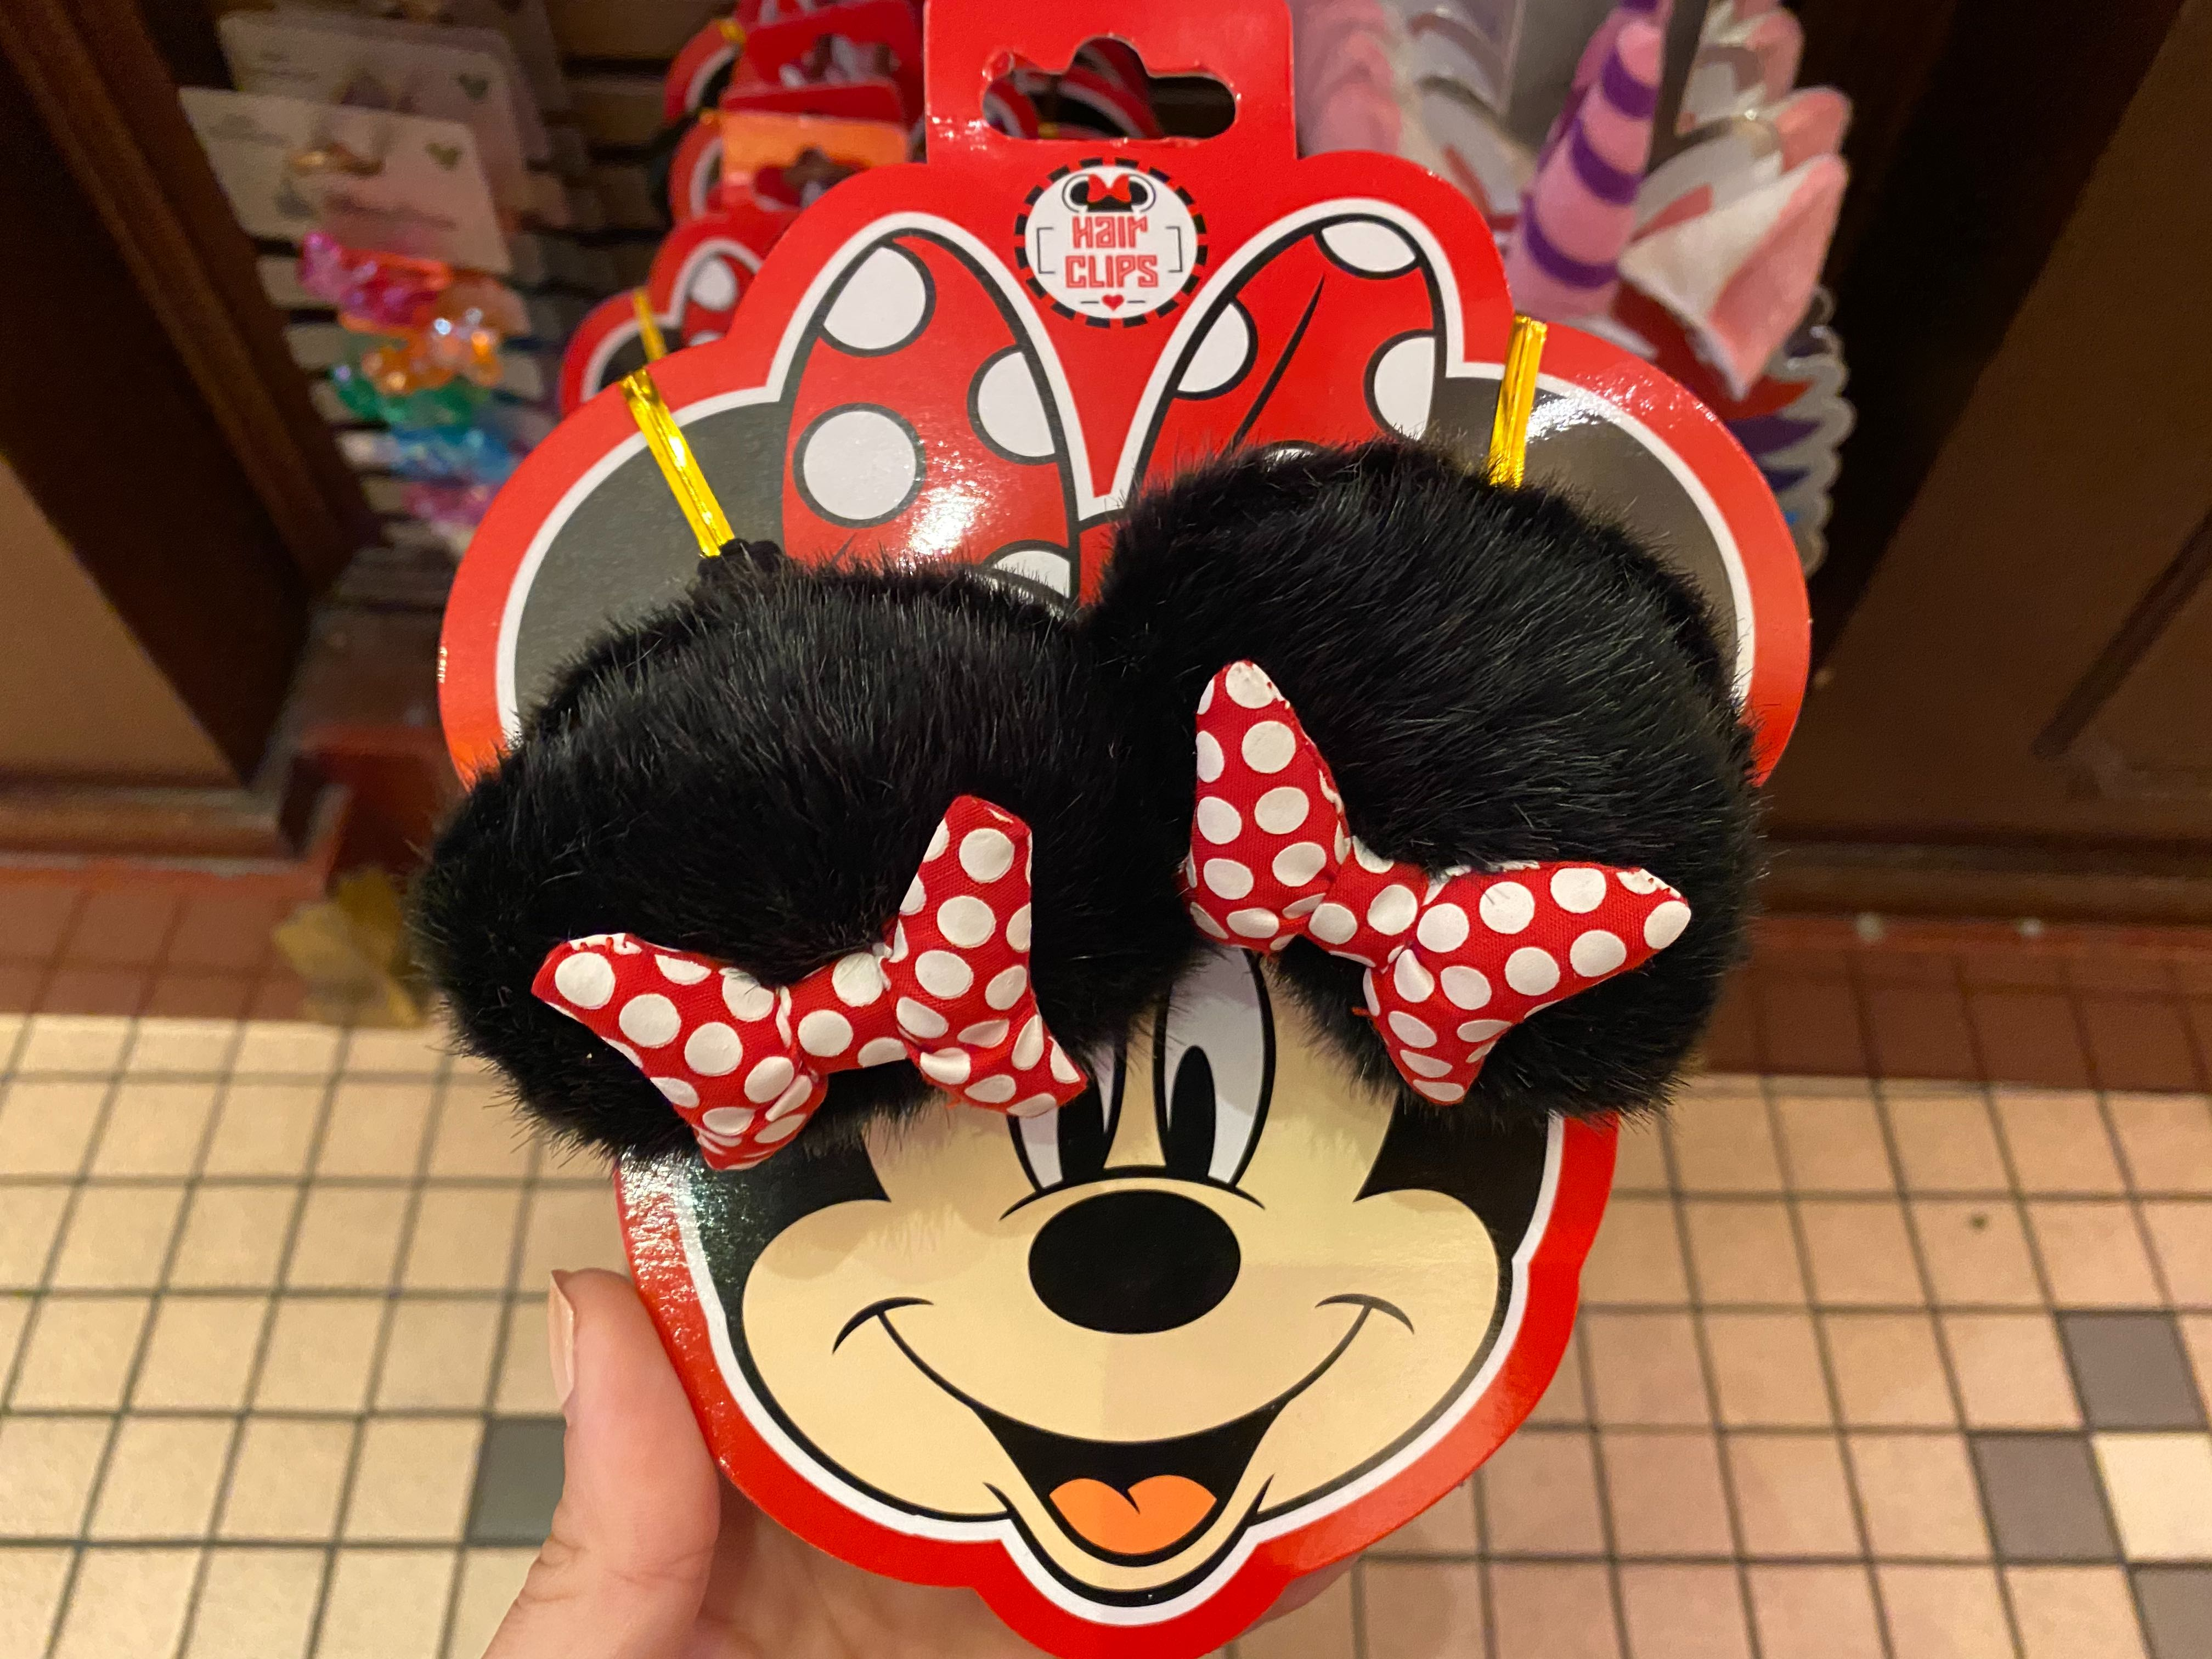 Minnie Mouse Hair Clips - $9.99